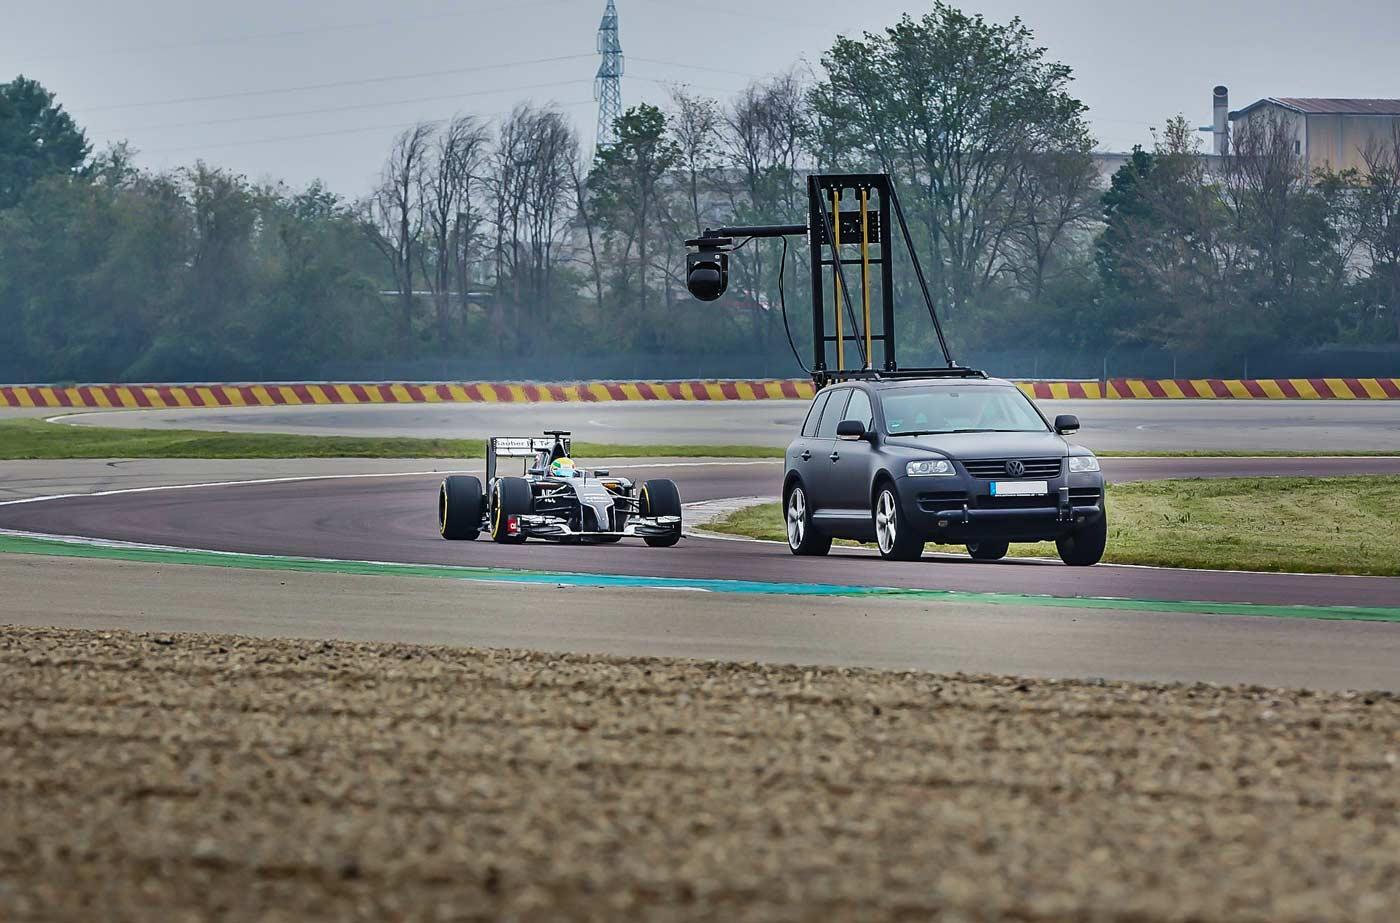 Sauber F1 Shotver System